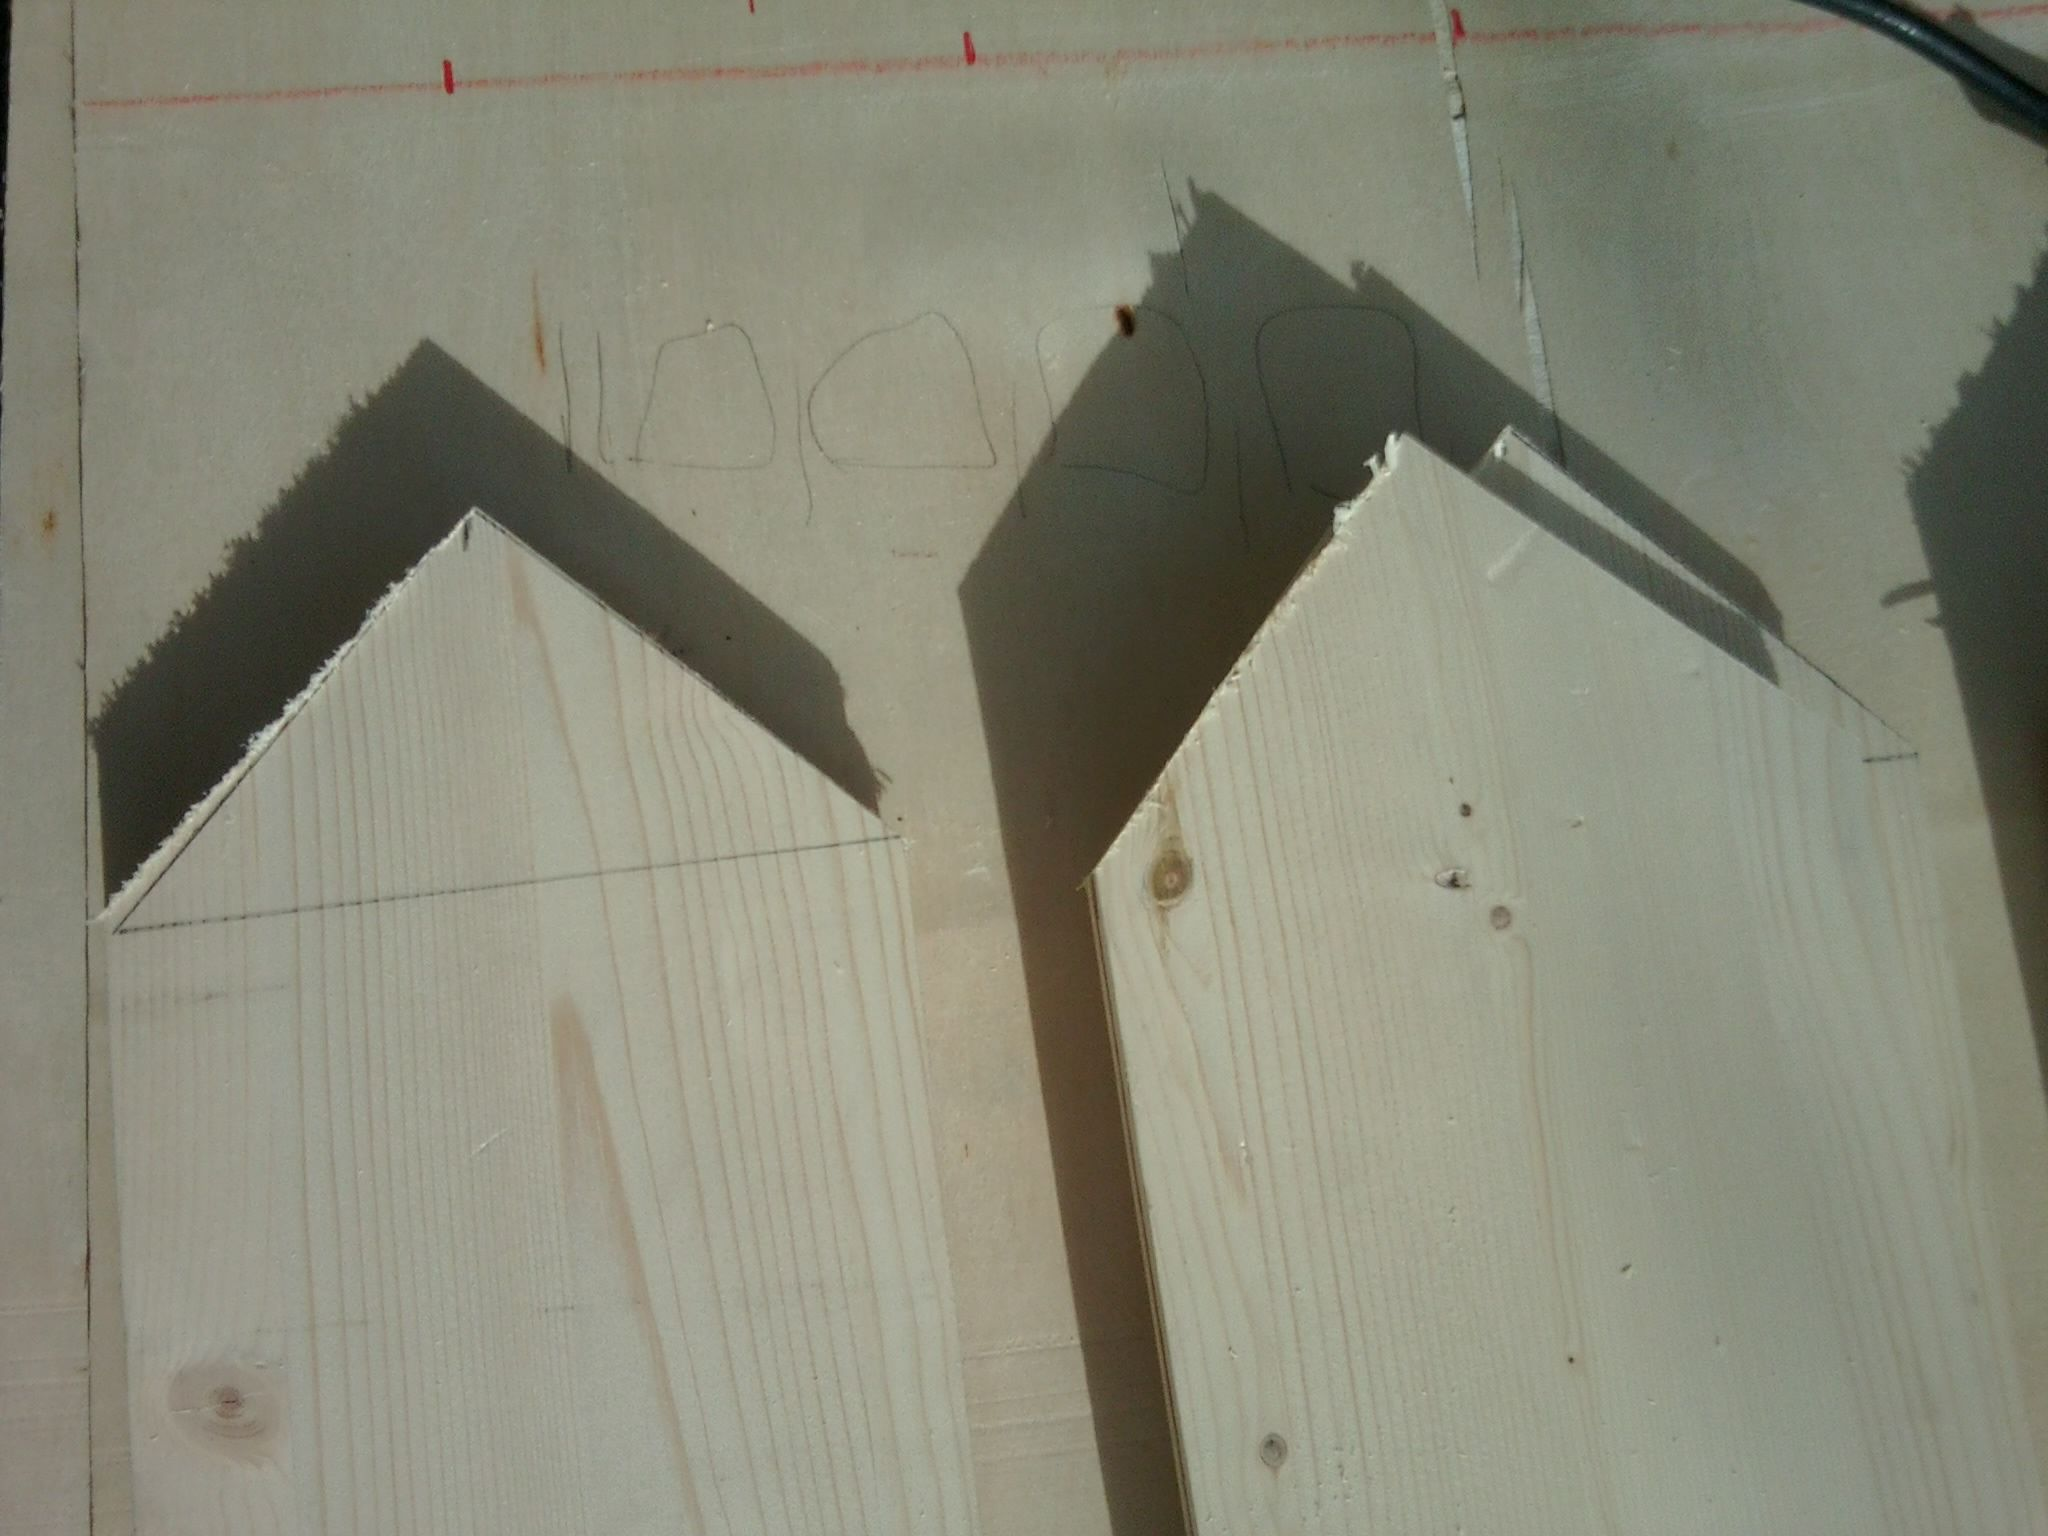 fabrication un brise vue recup palette. Black Bedroom Furniture Sets. Home Design Ideas